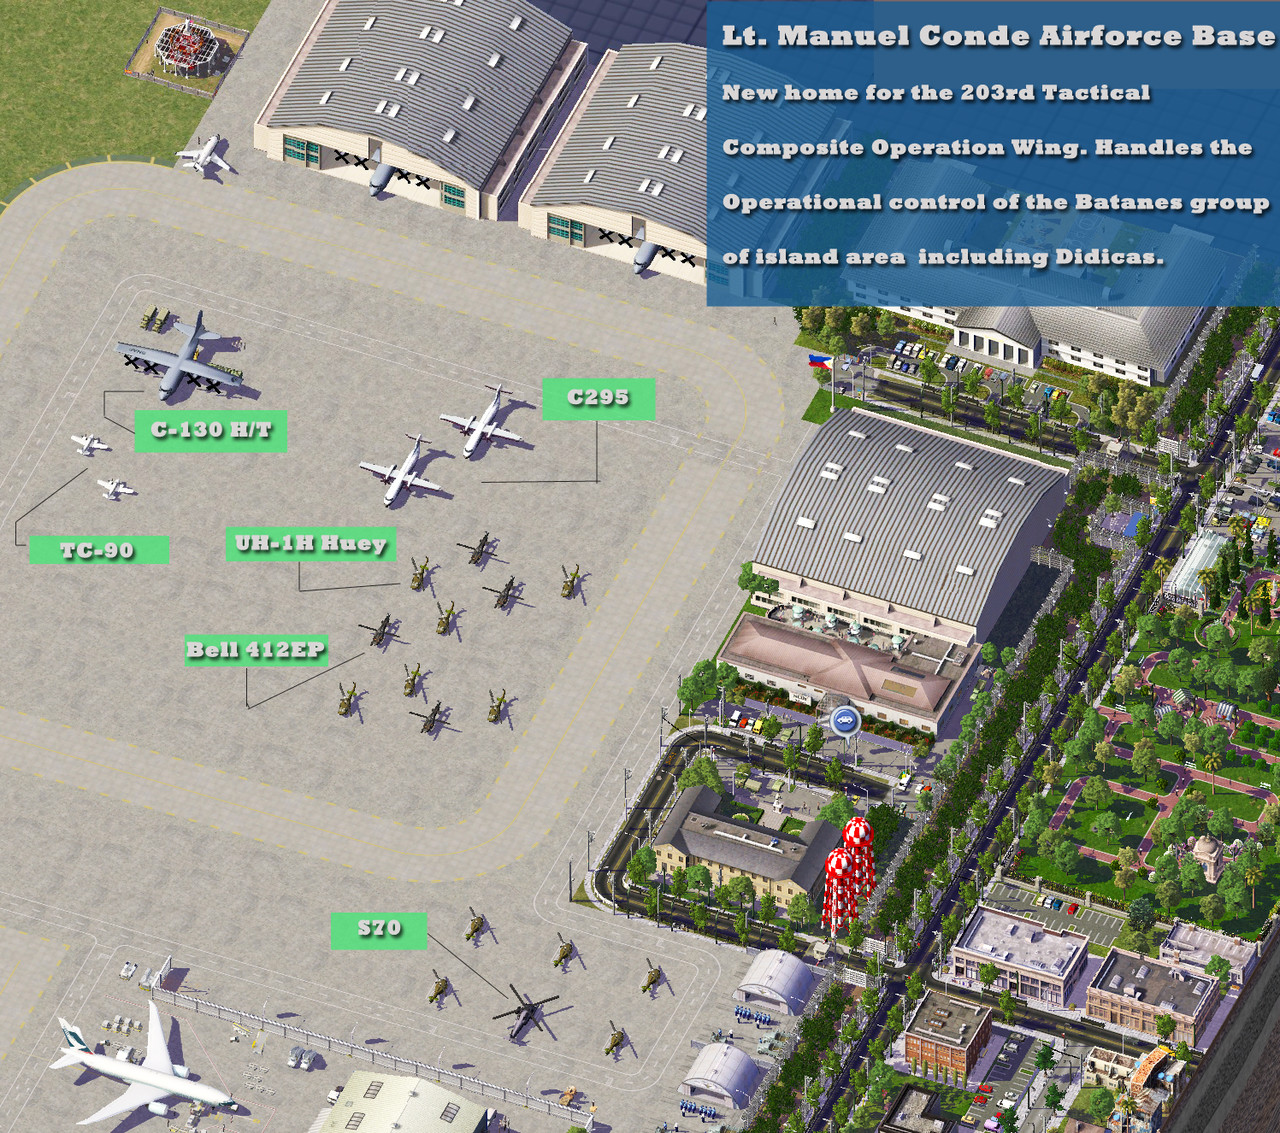 Airbase.thumb.jpg.ead33d6e01b37d08a87bcba841b539be.jpg